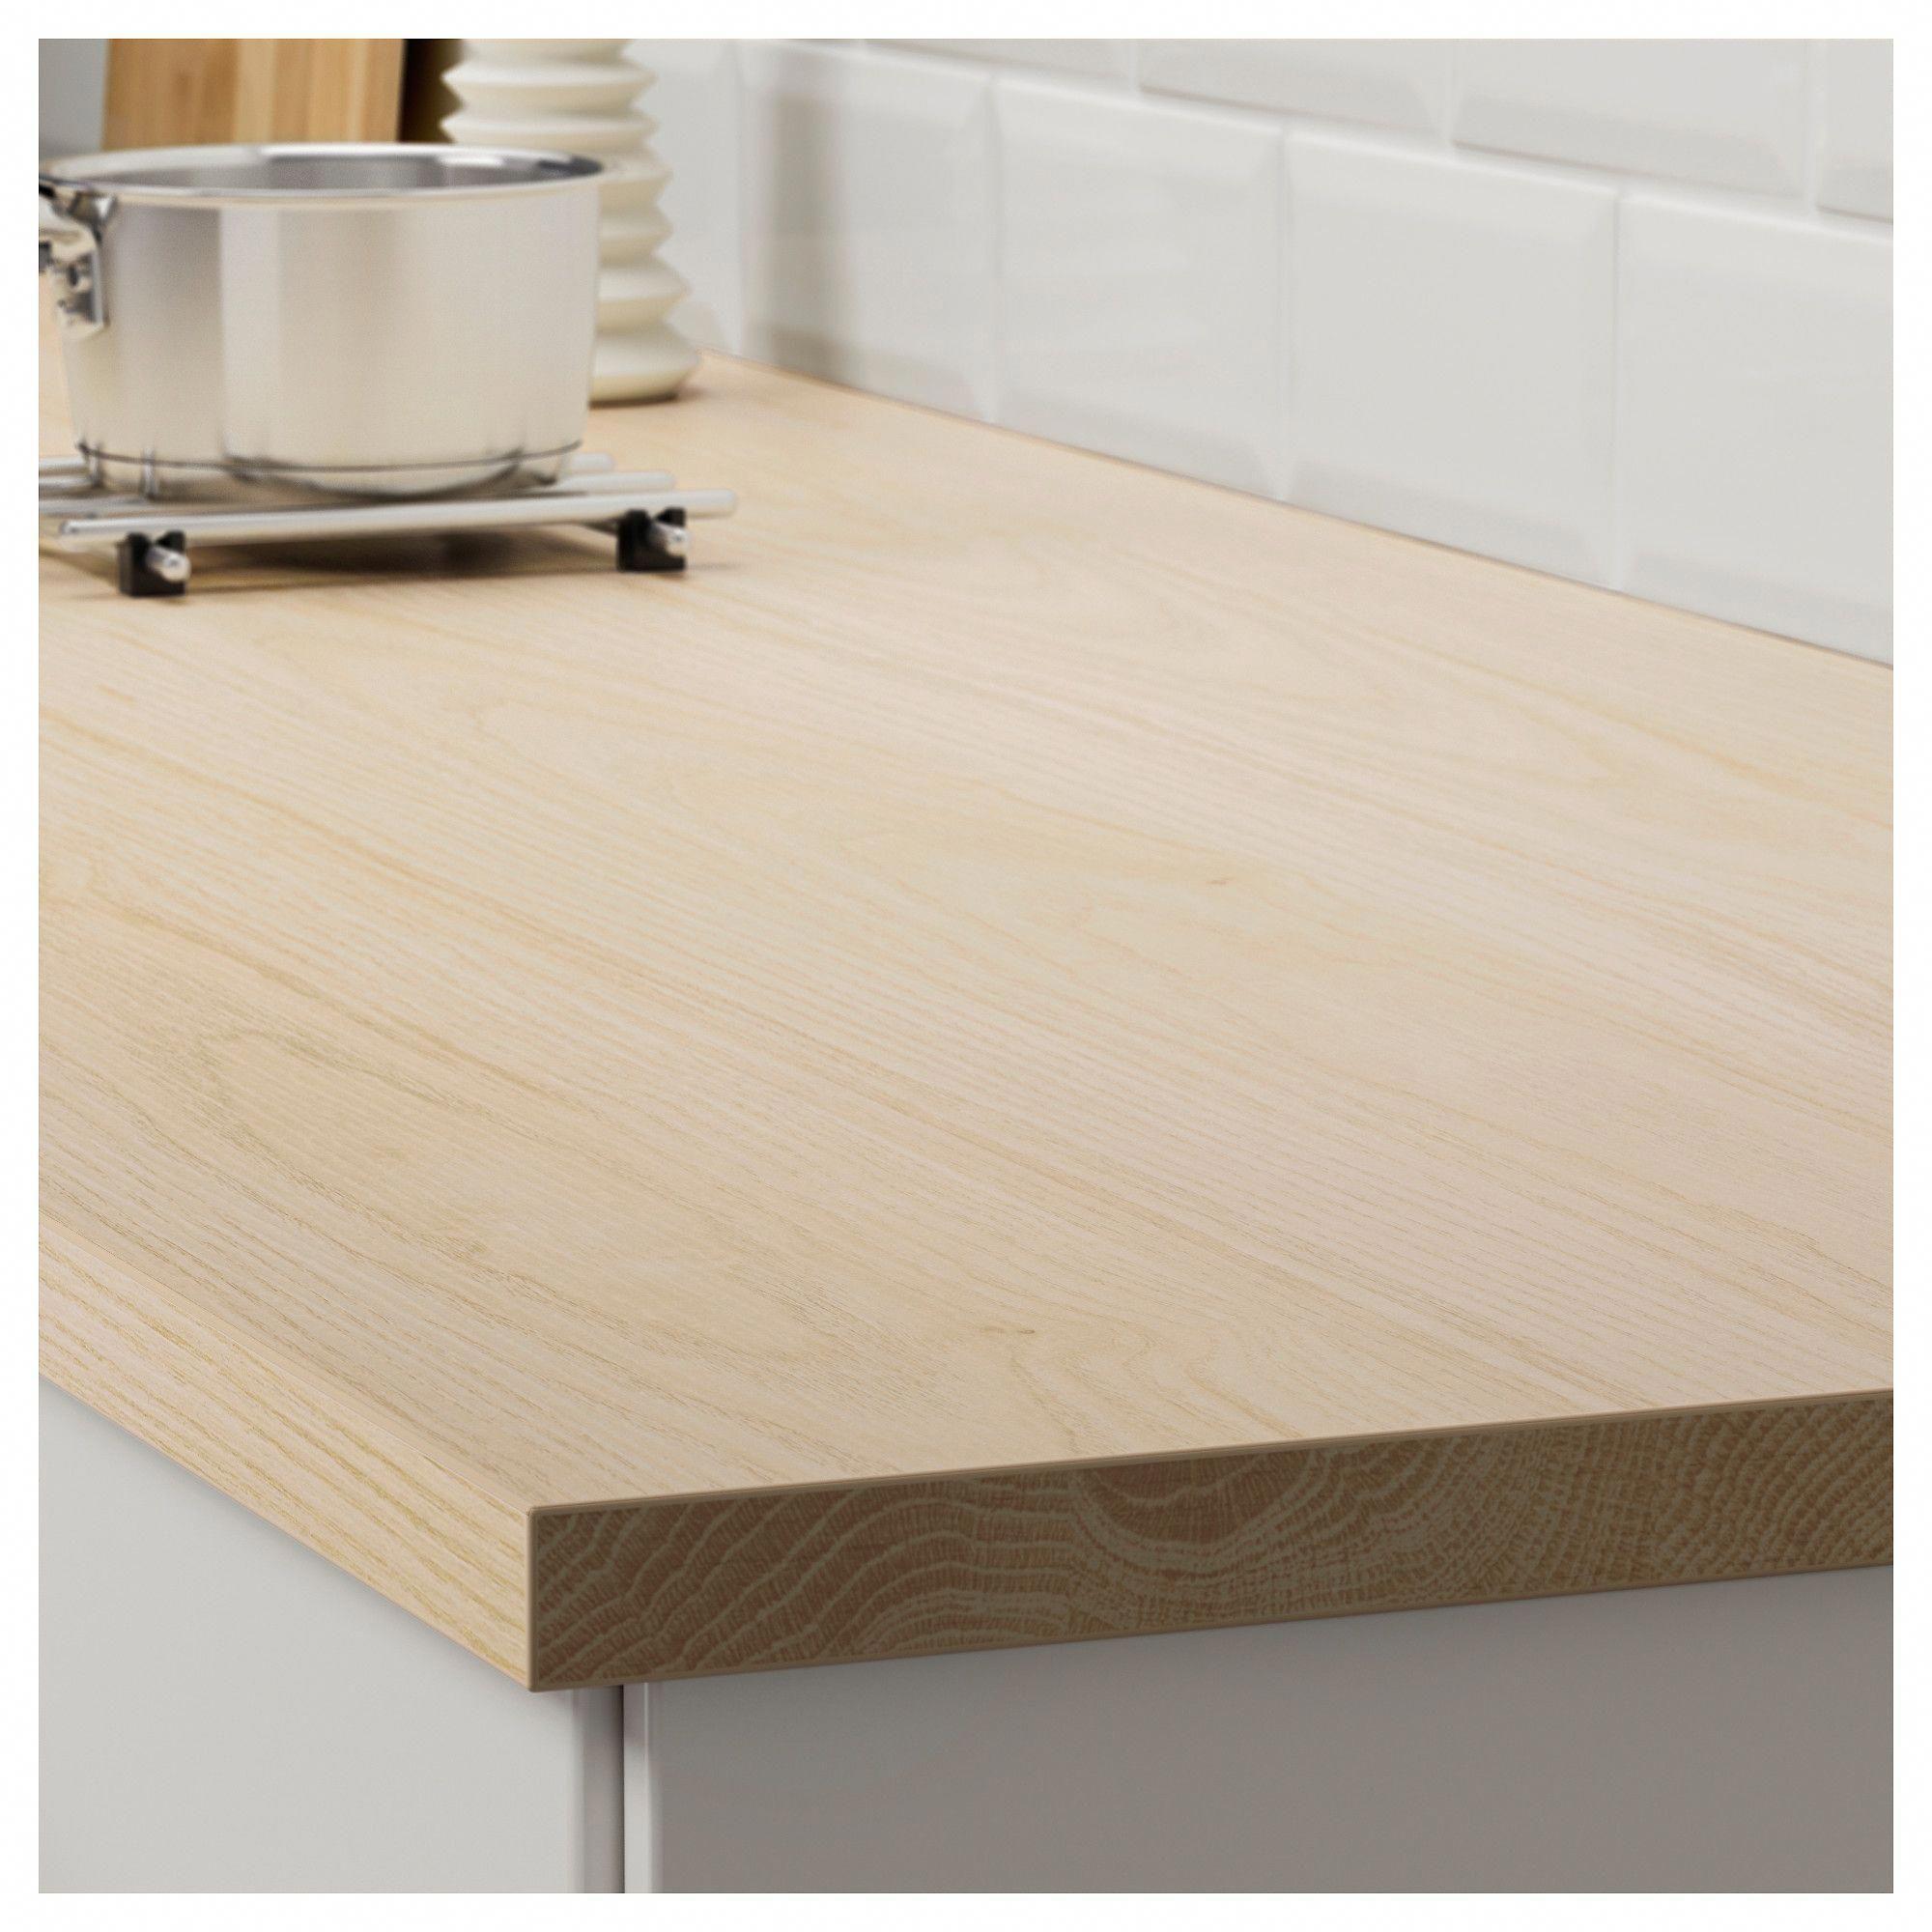 Ikea Ekbacken Countertop Ash Effect Modernhomedecorkitchen